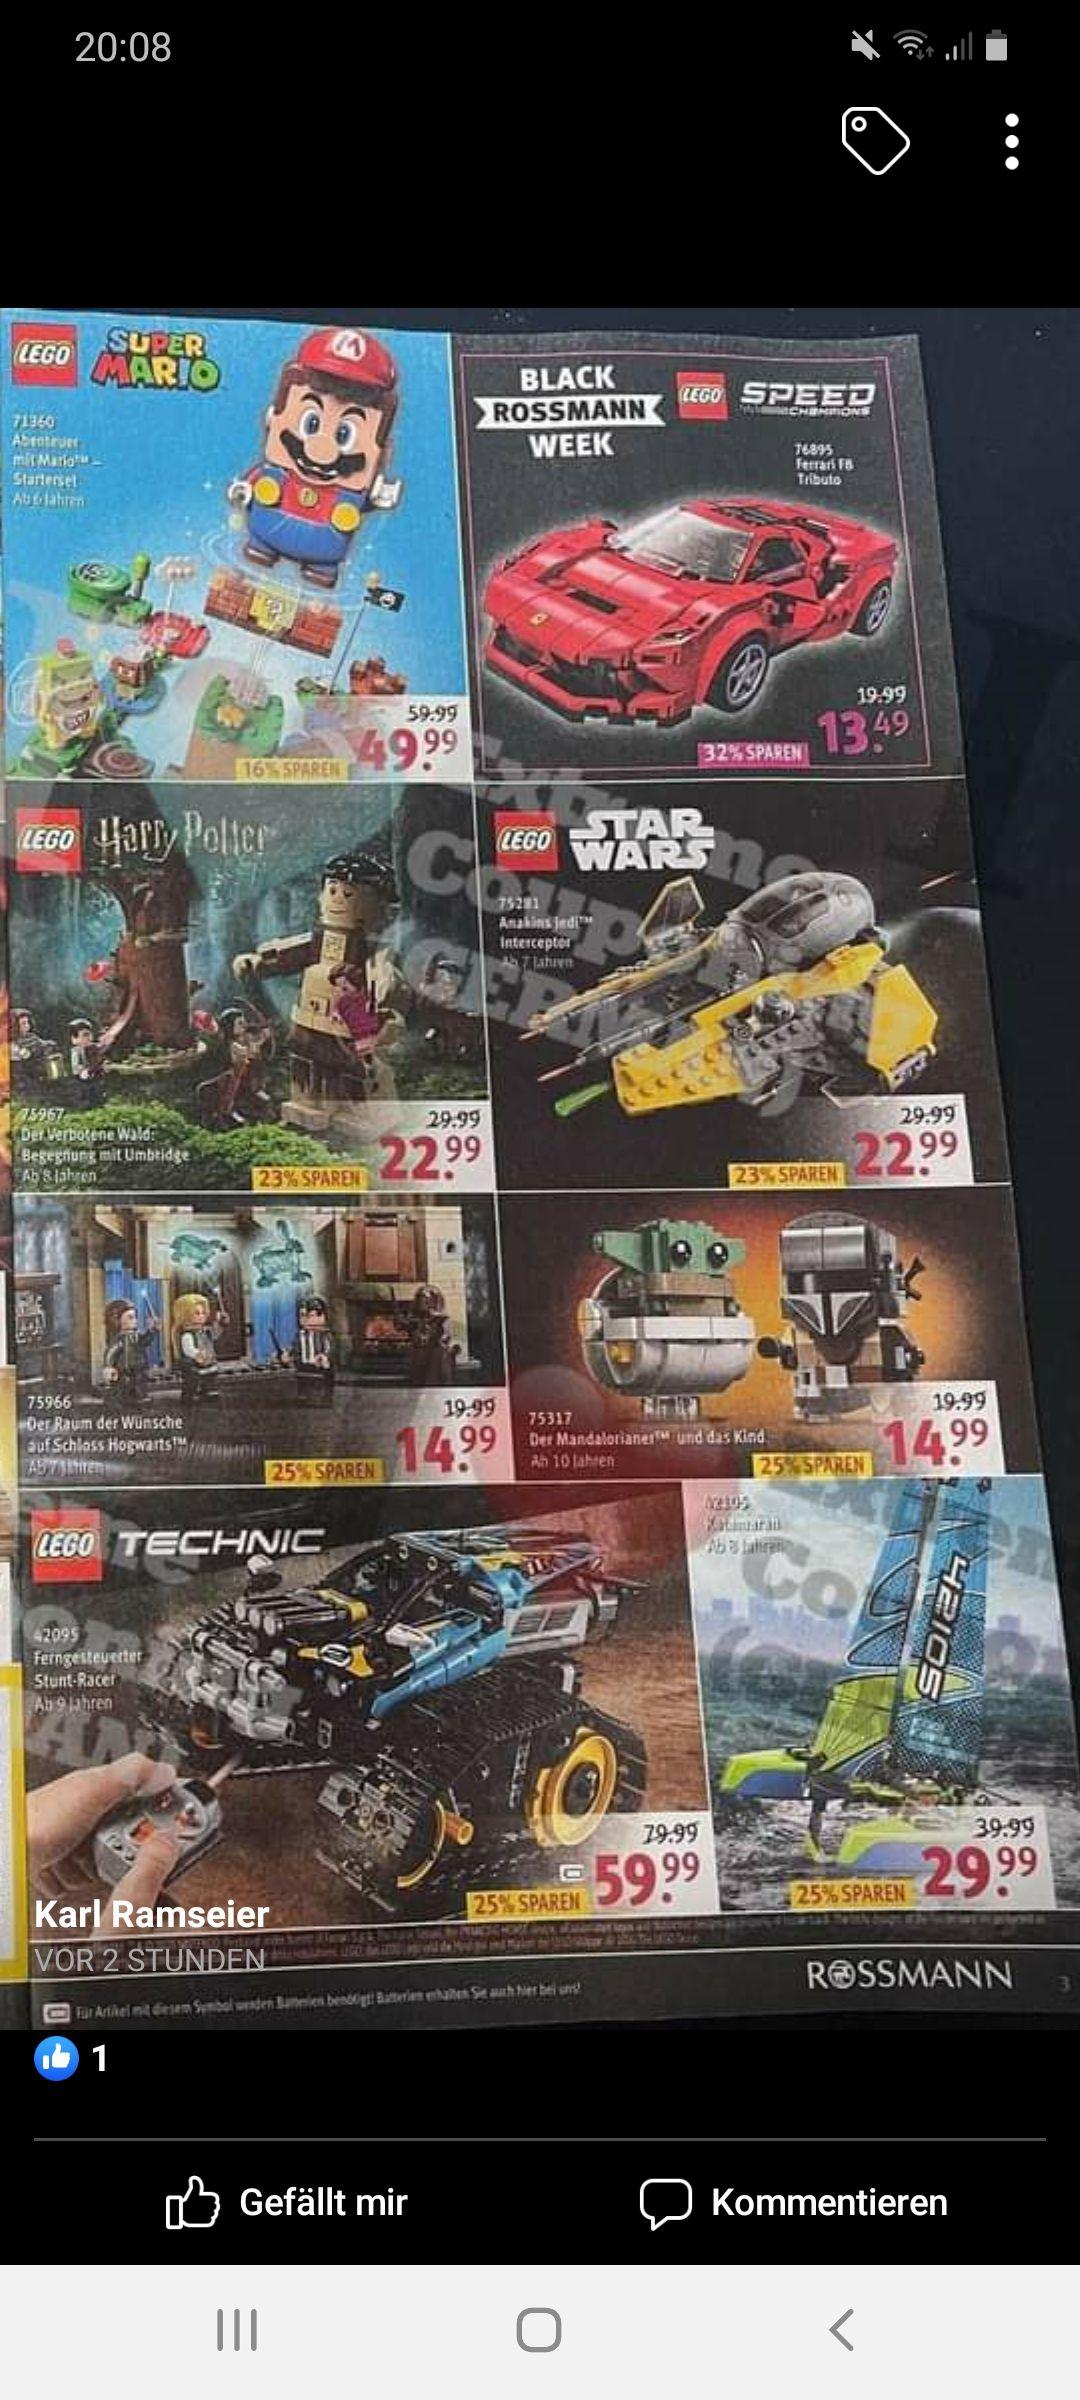 [Rossmann Black Week] u.a. Lego Ferrari F8 Tributo 76895 (12,14 €), Mandalorianer 75317 (13,49 €), Batmobile 76119 (20,69 €)